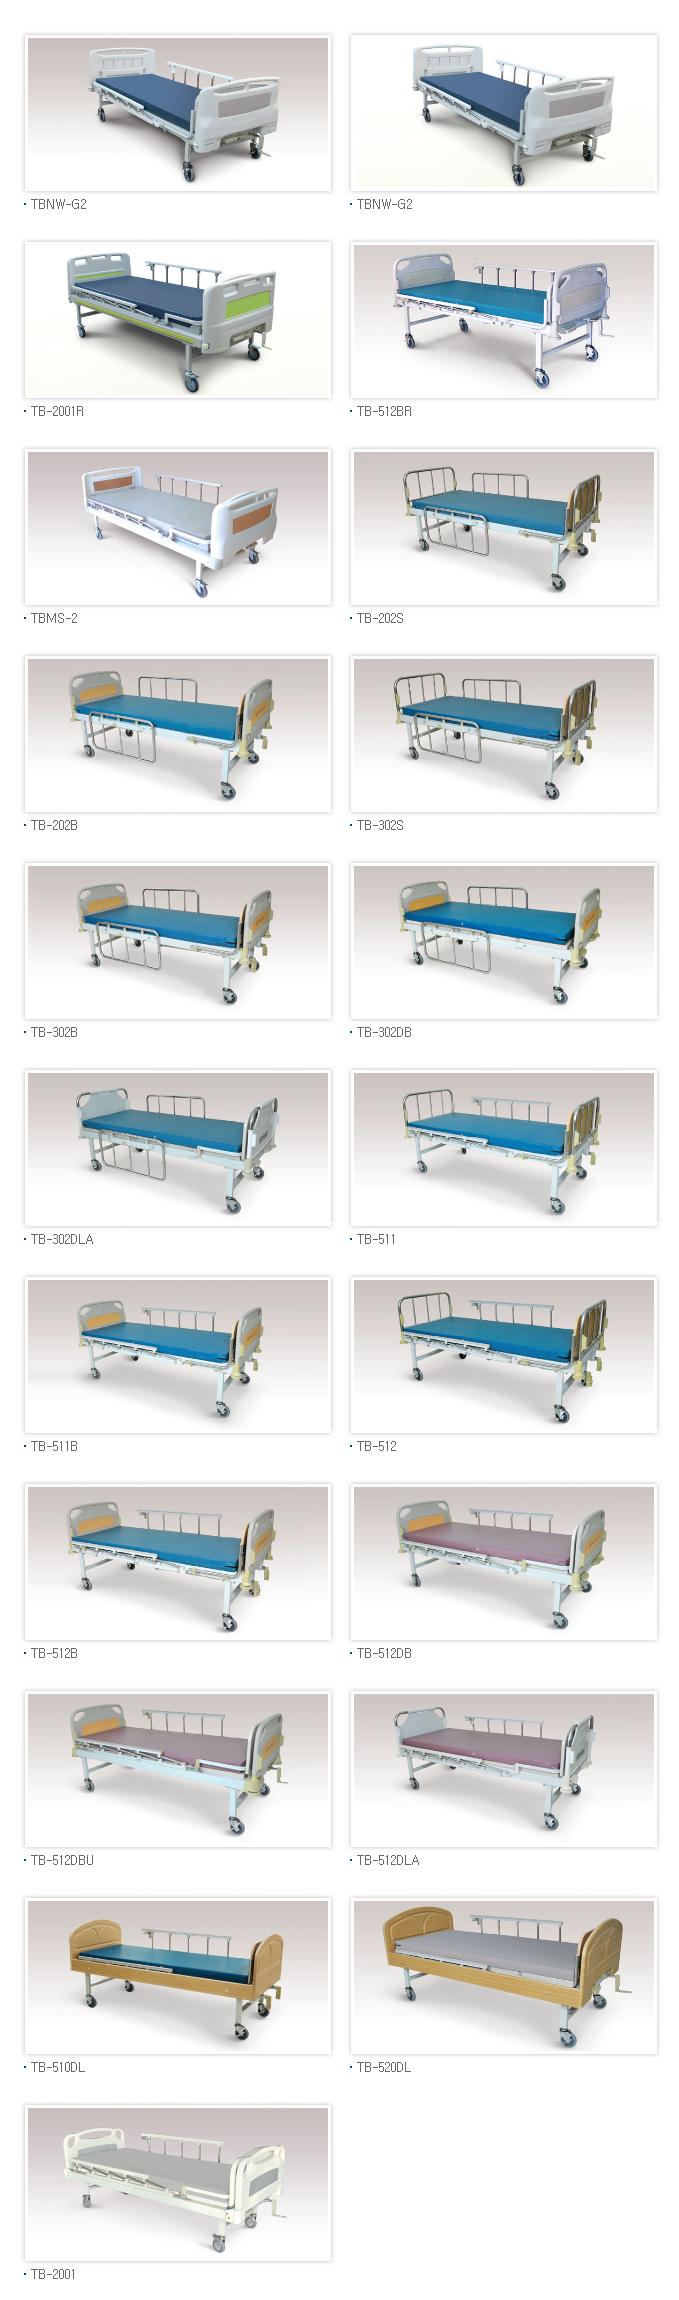 TAEDONG PRIME Manual Bed